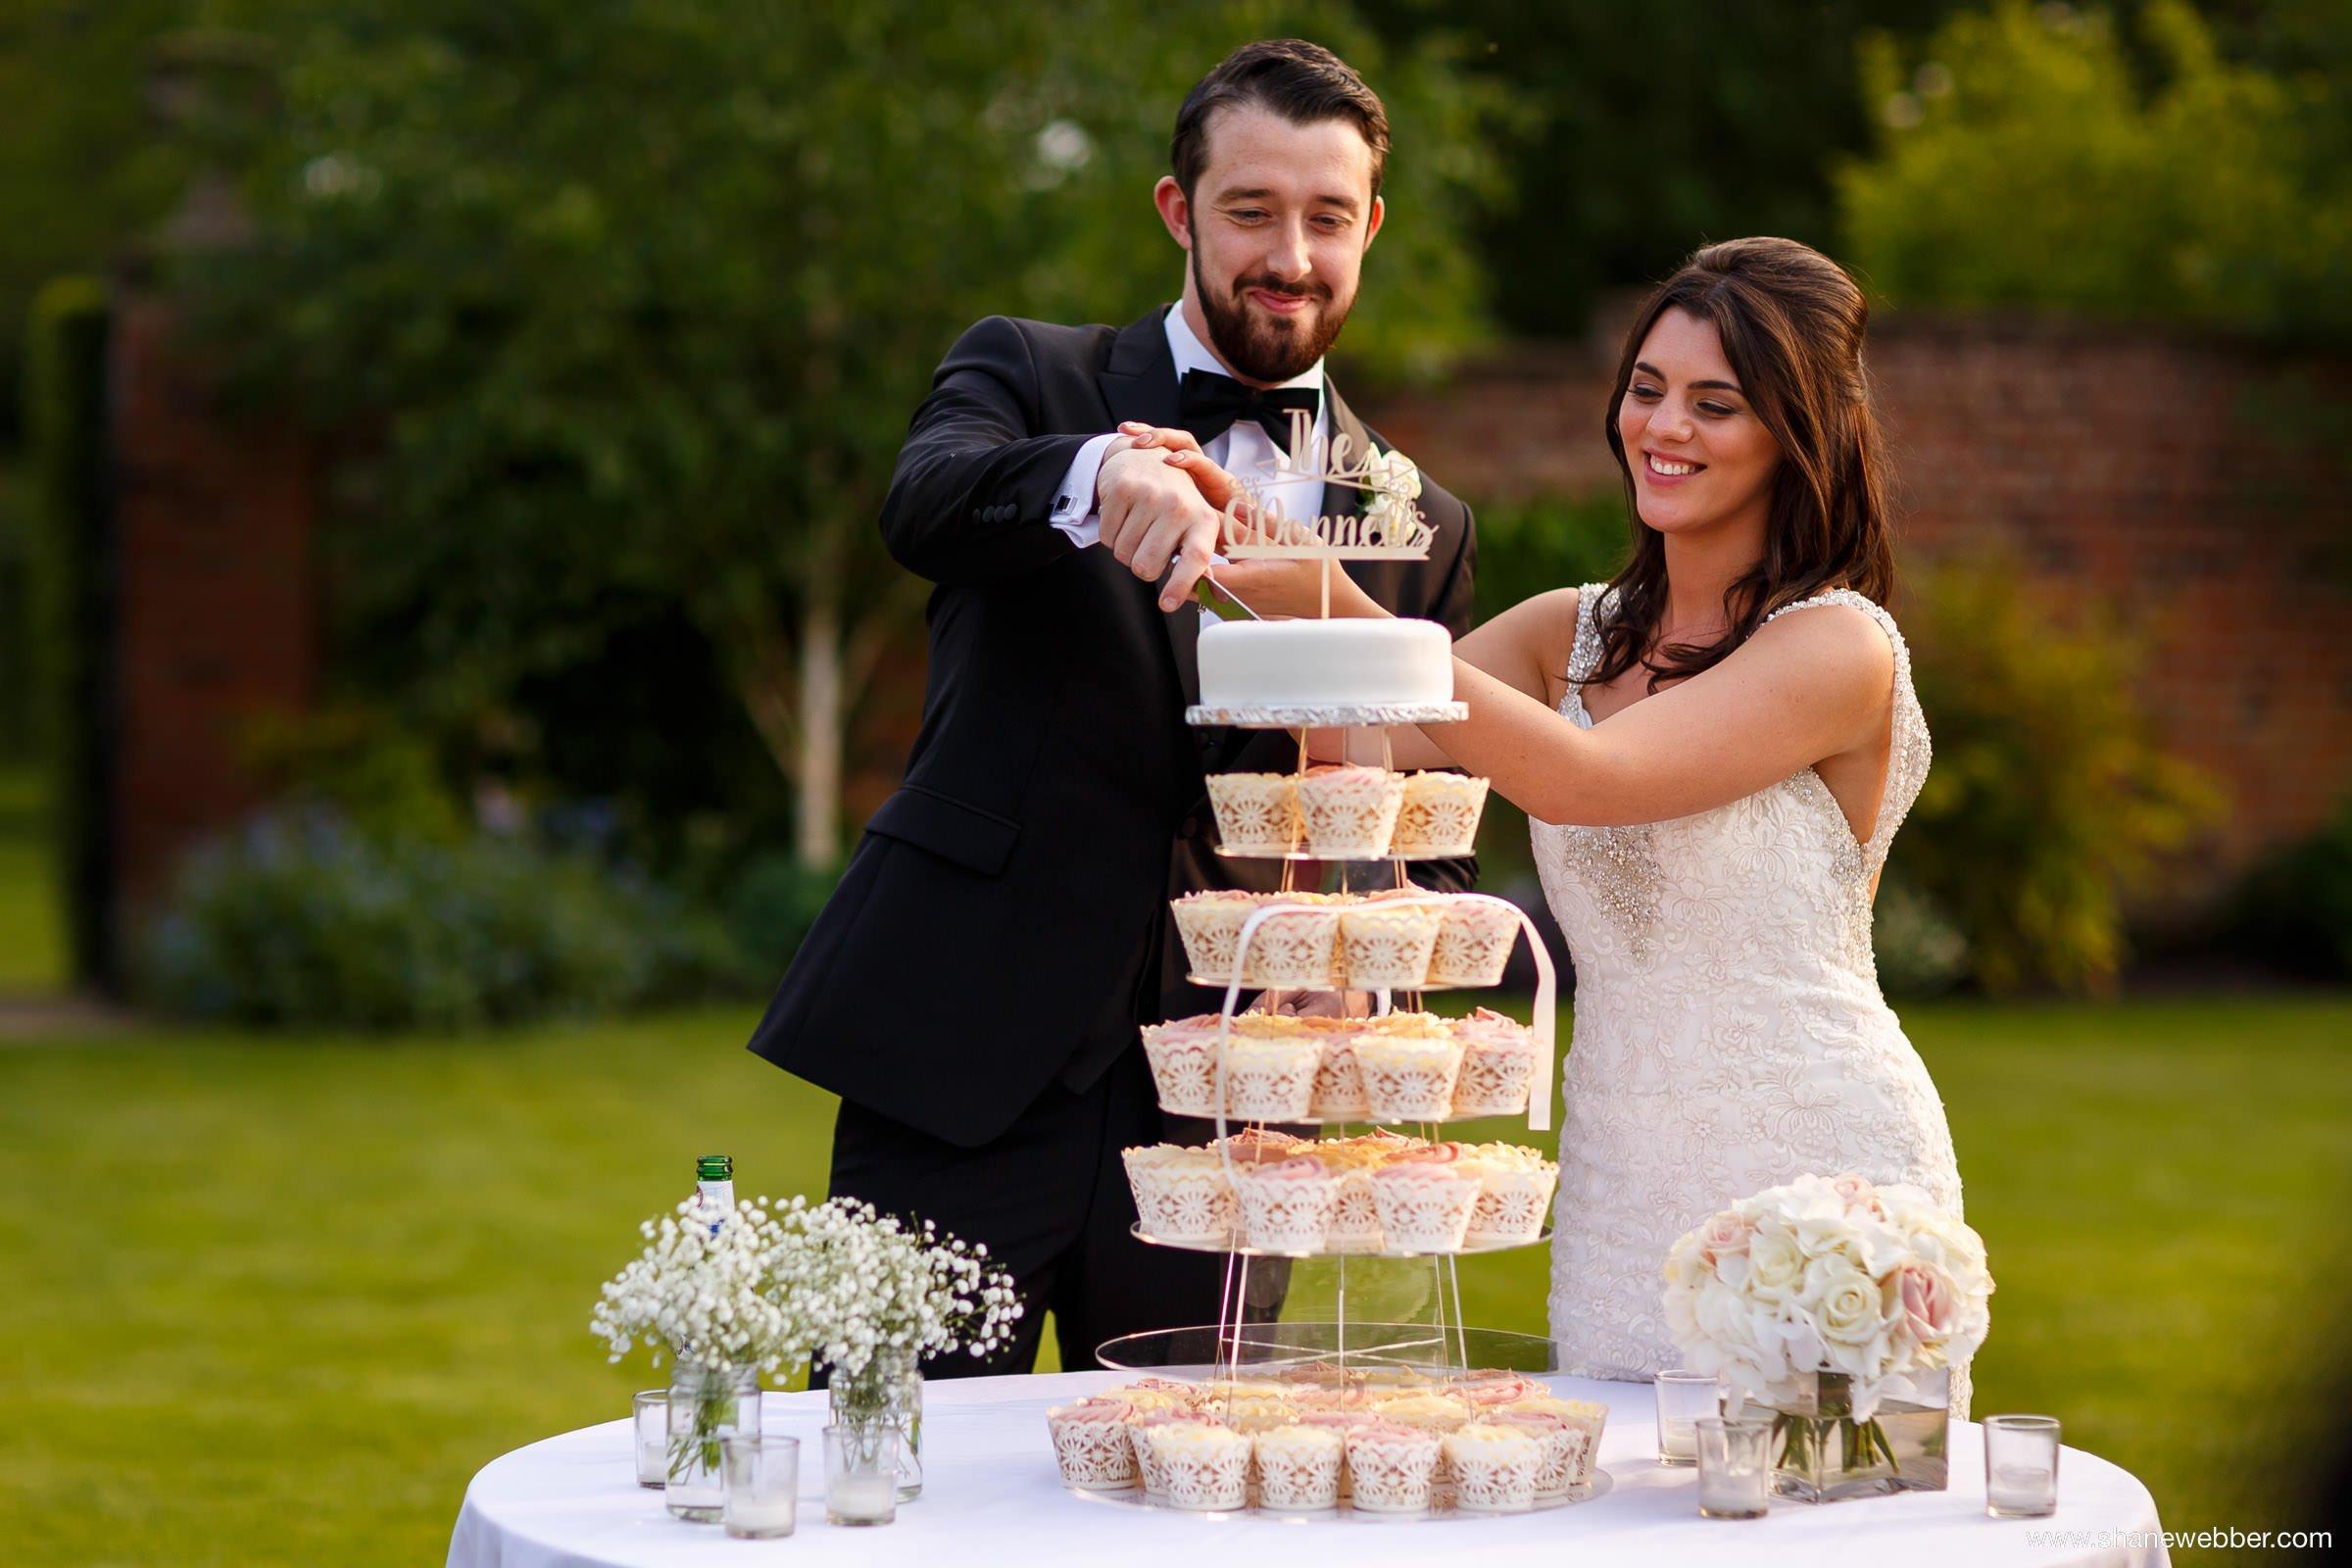 Cake cutting photograph